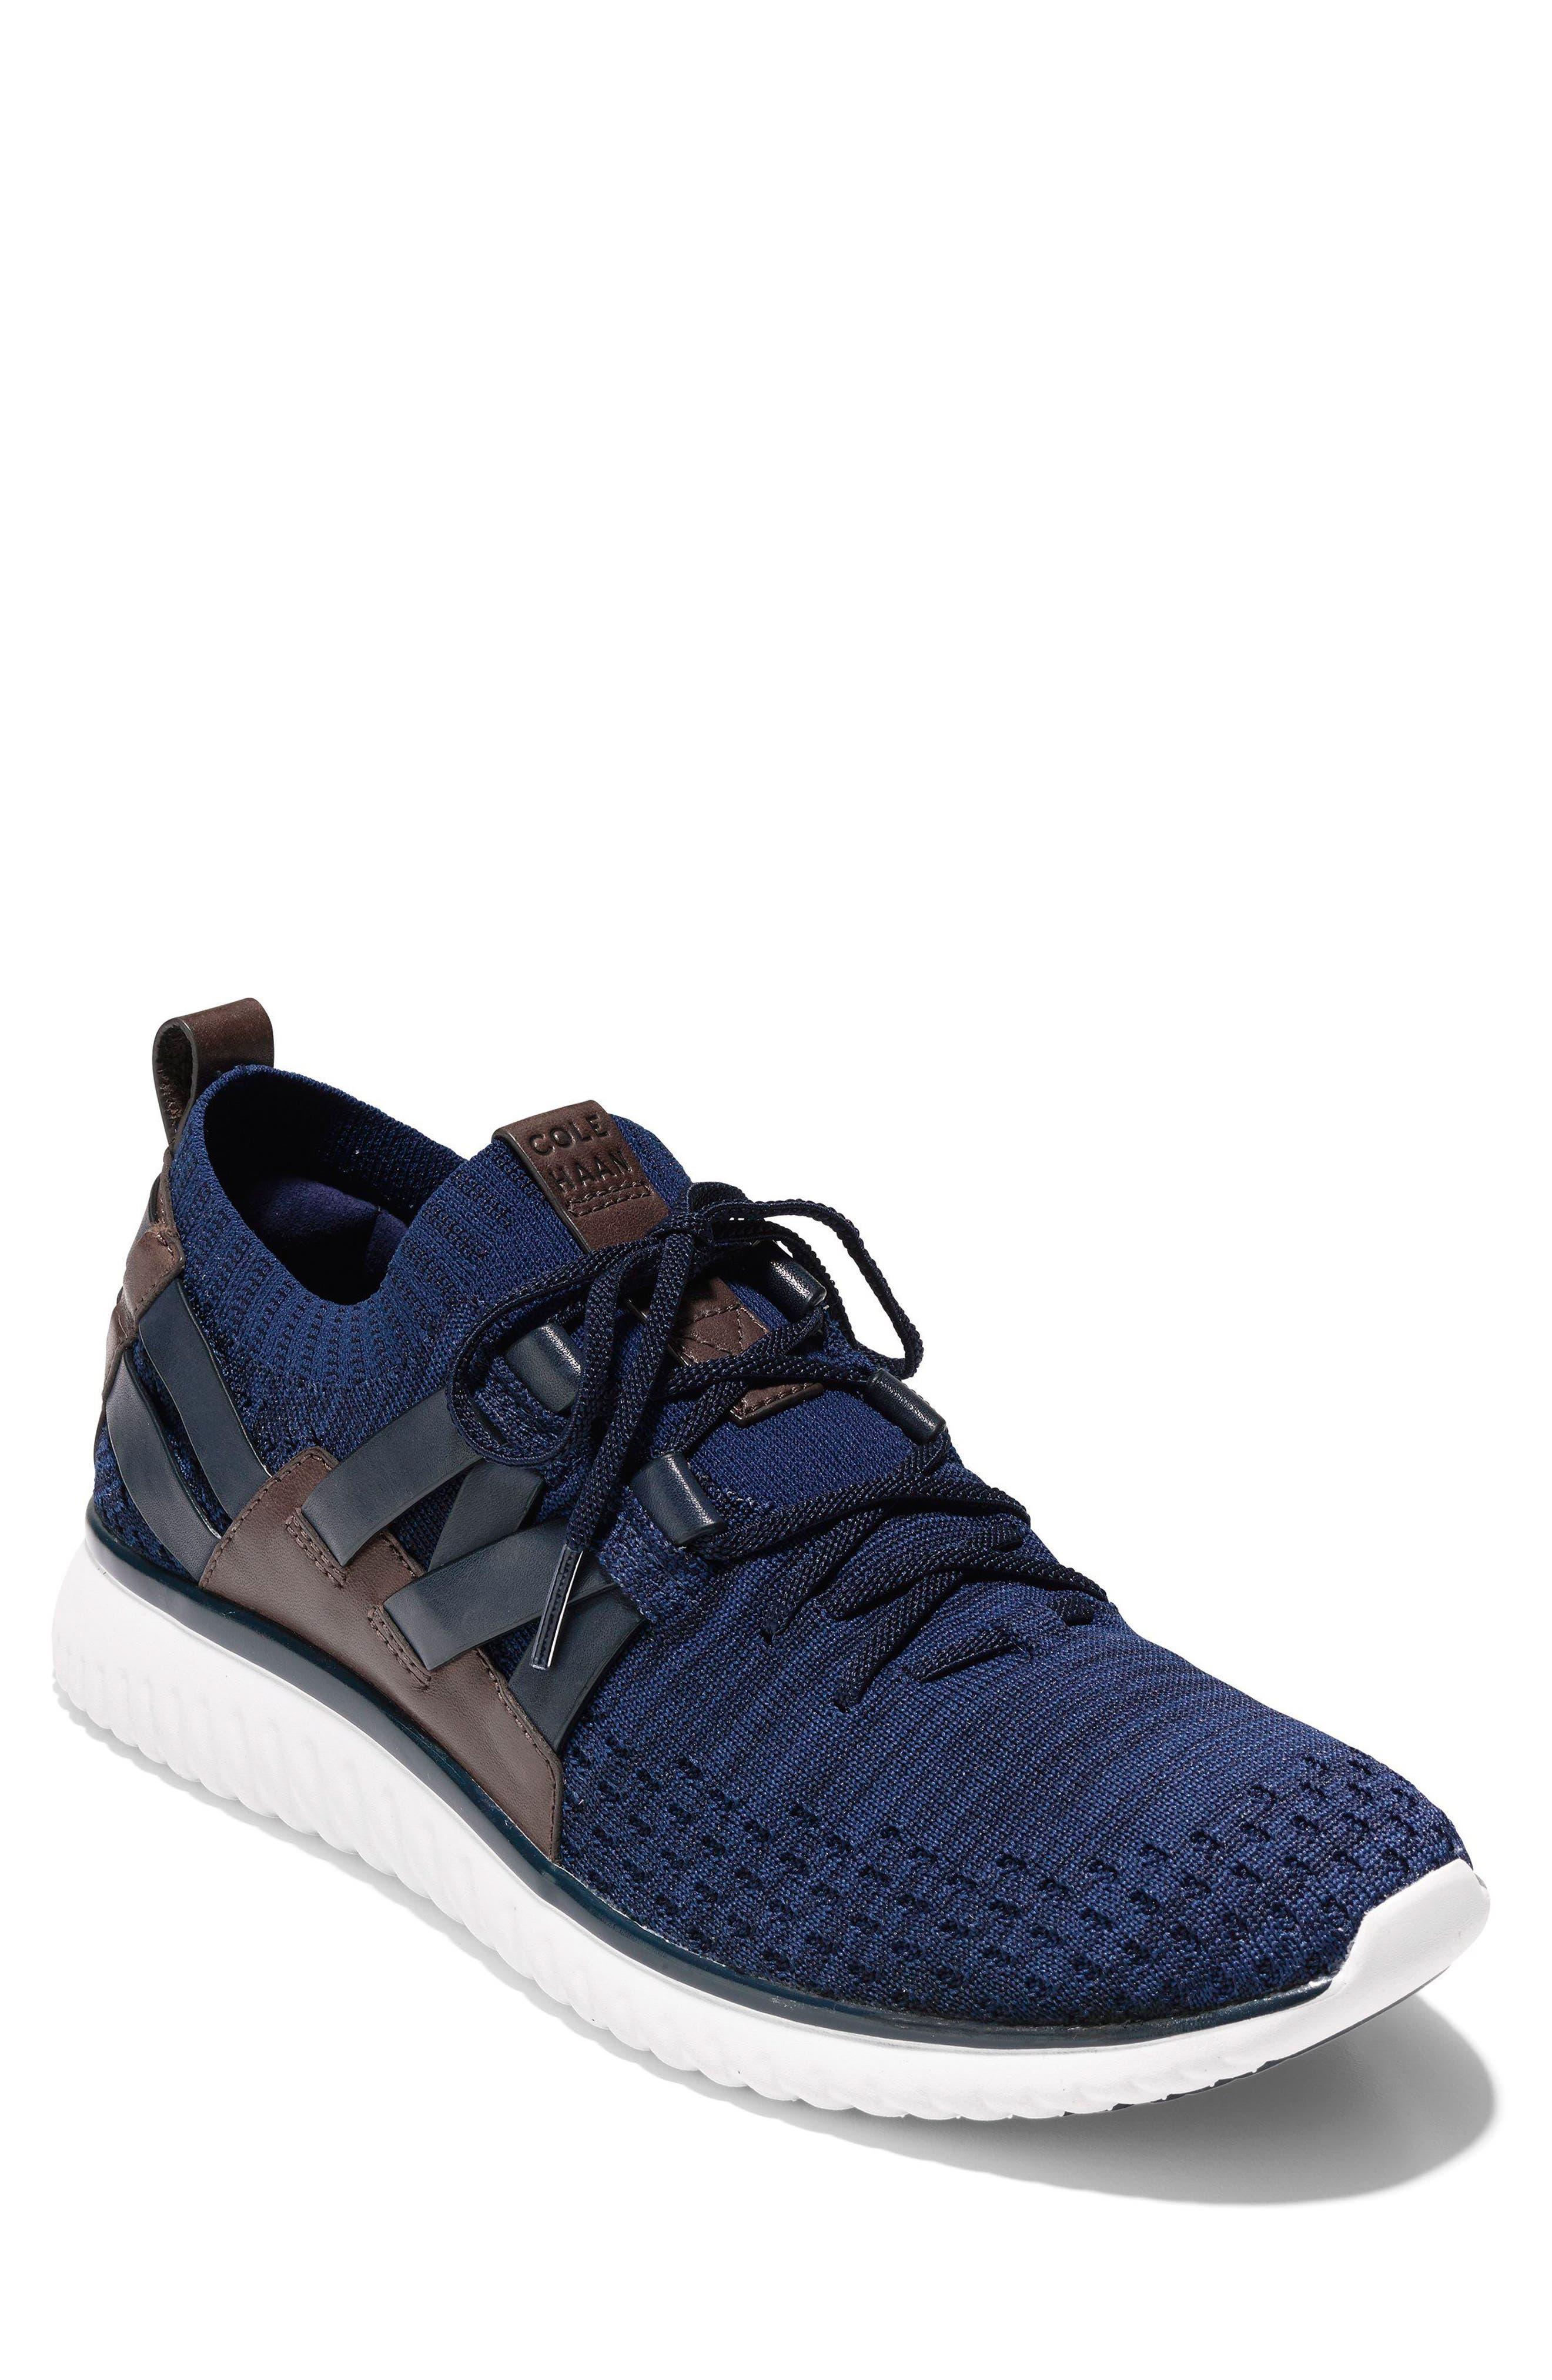 Alternate Image 1 Selected - Cole Haan Grand Motion Sneaker (Men)